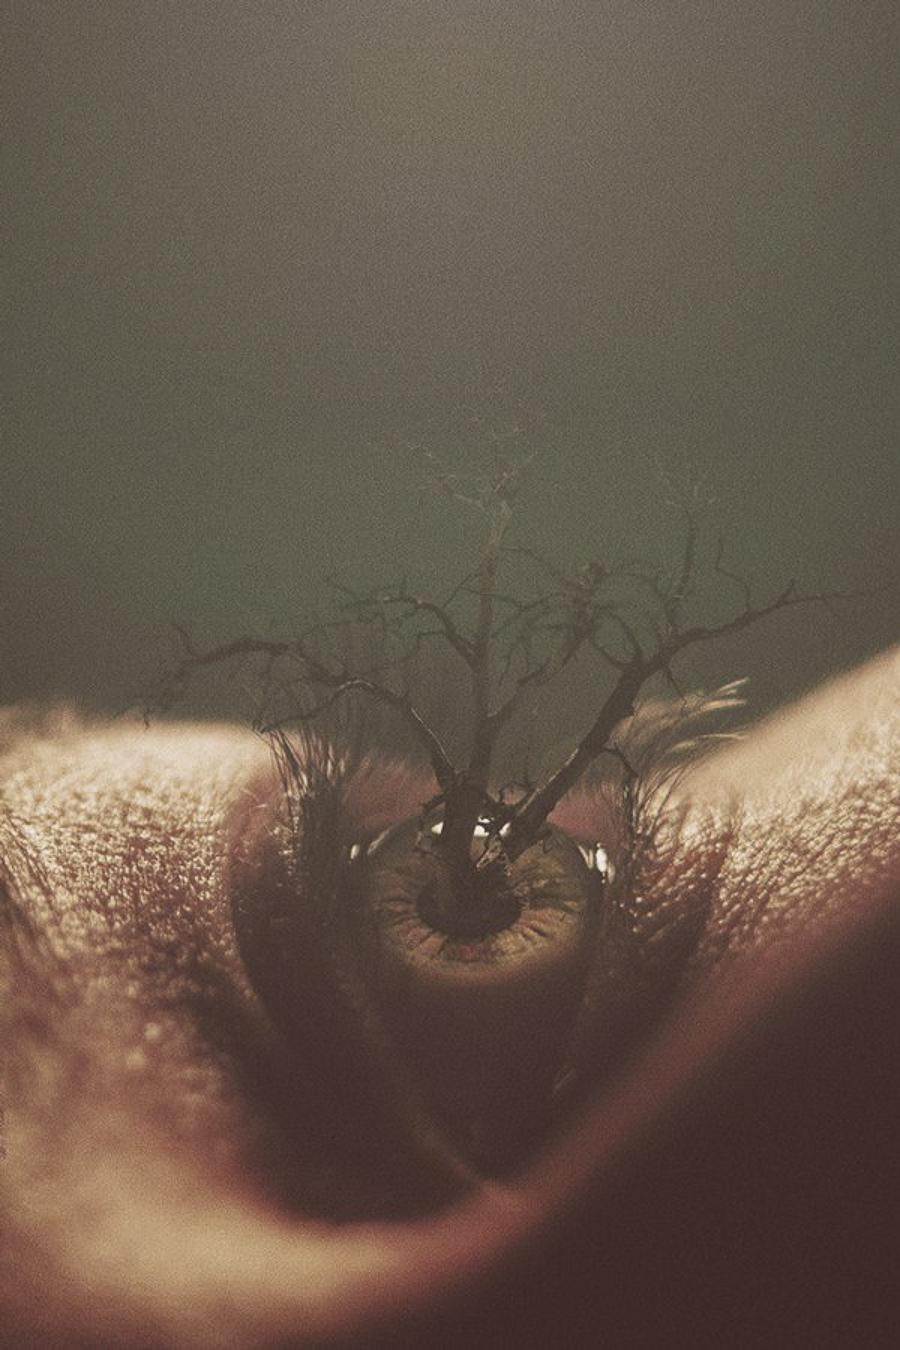 Eyes by Nevan Doyle